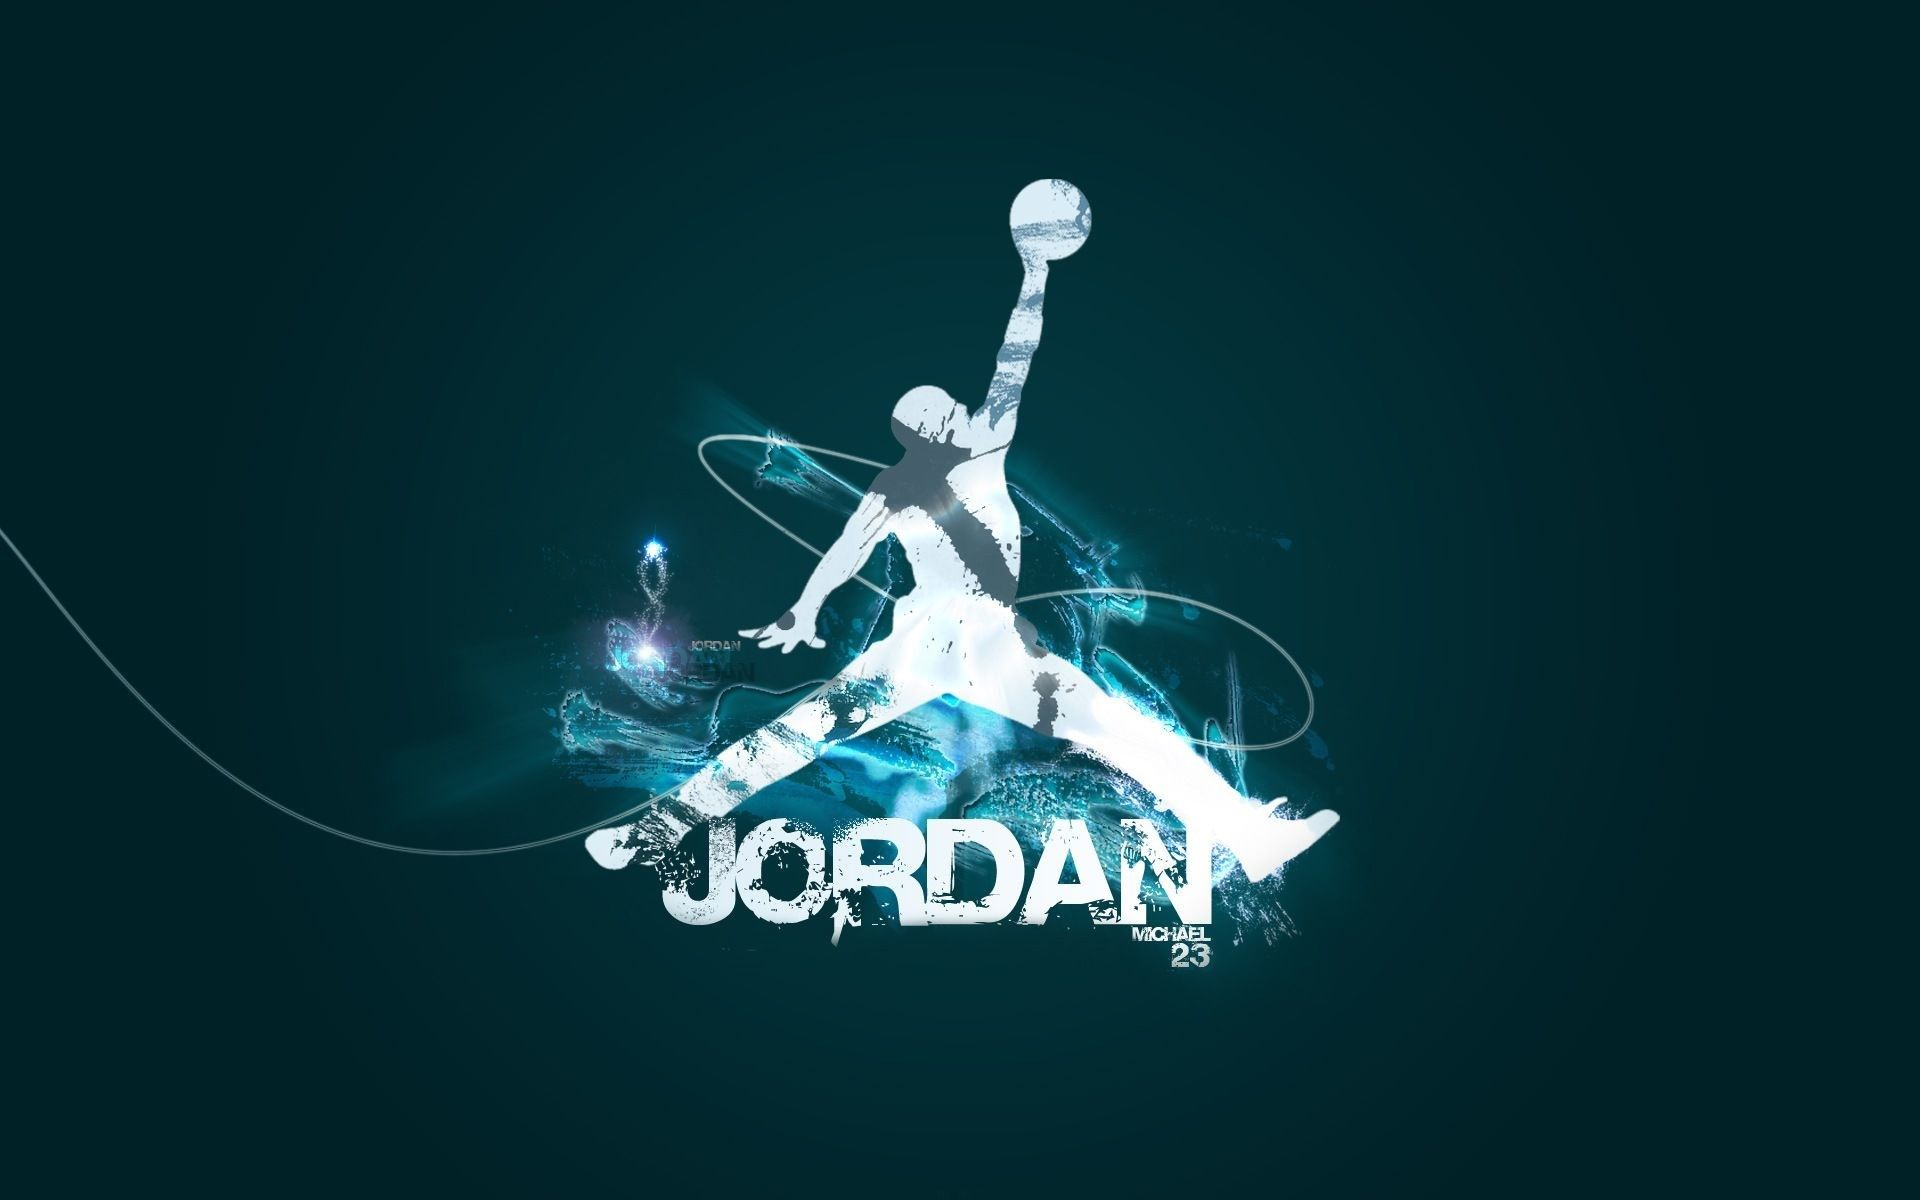 Hd air jordan shoes background ololoshenka pinterest hd air jordan shoes background voltagebd Choice Image